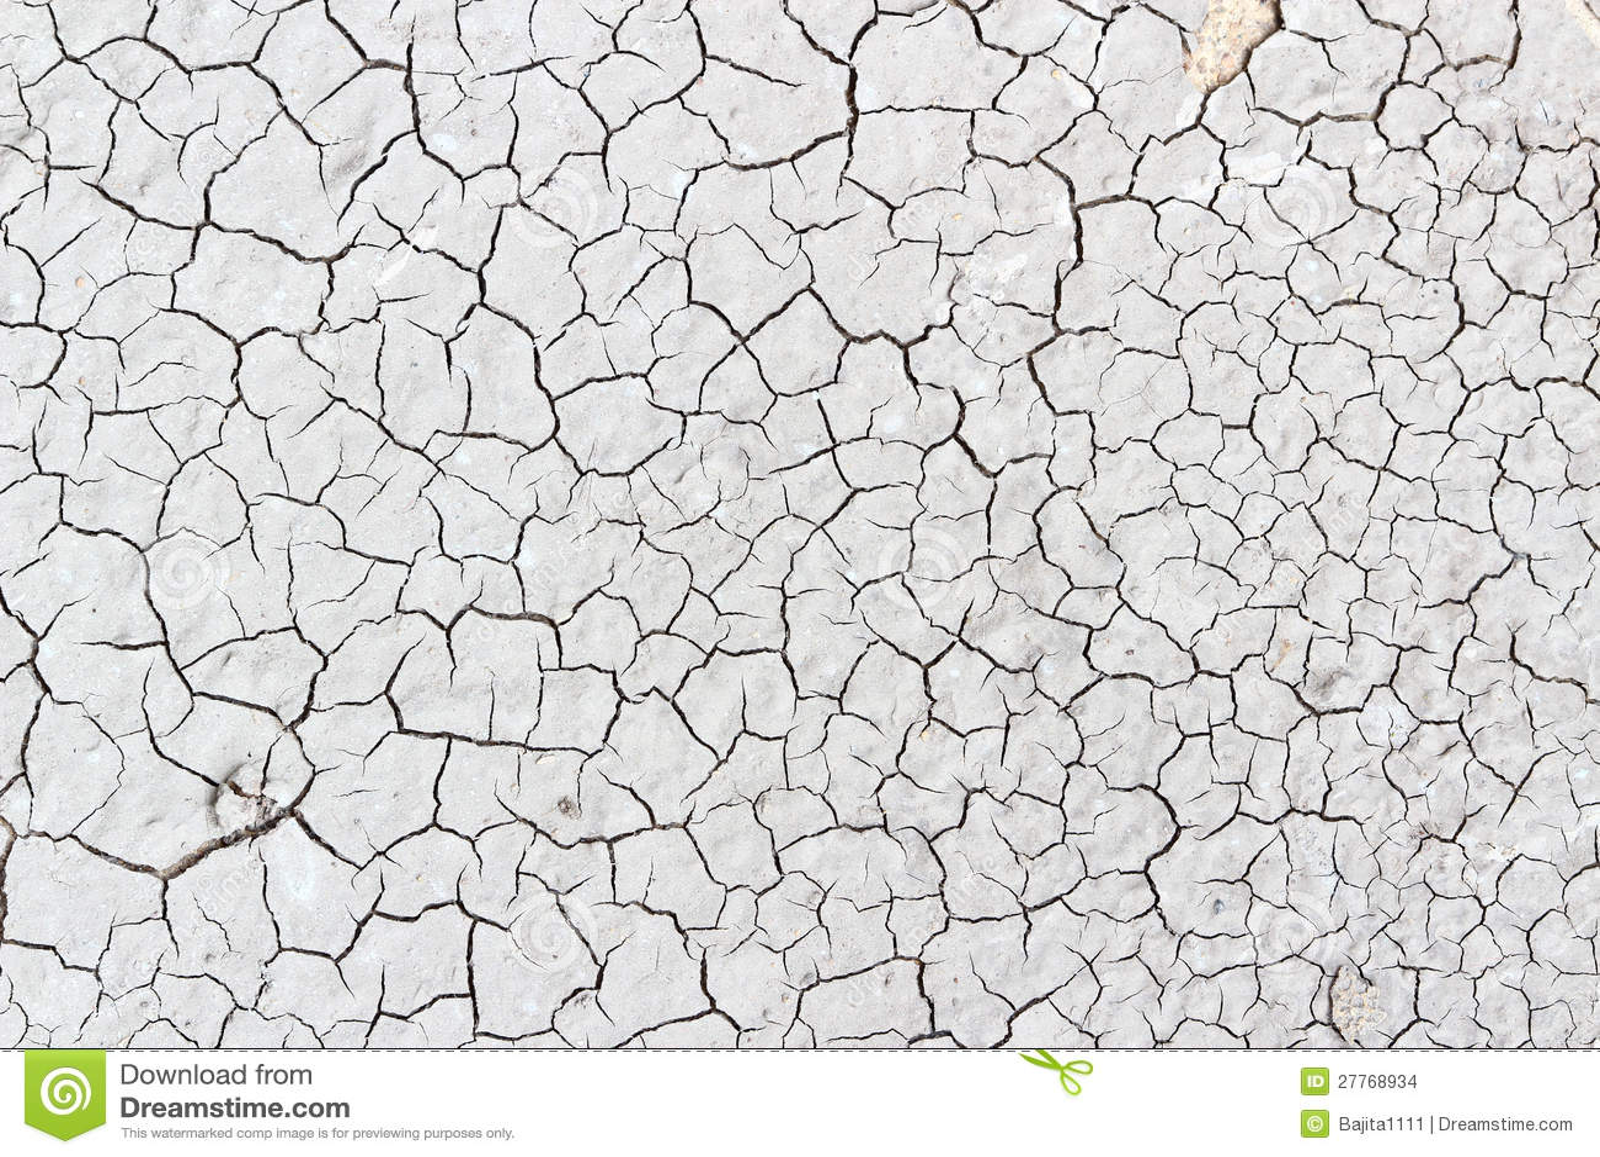 Crack Soil On Dry Seas...